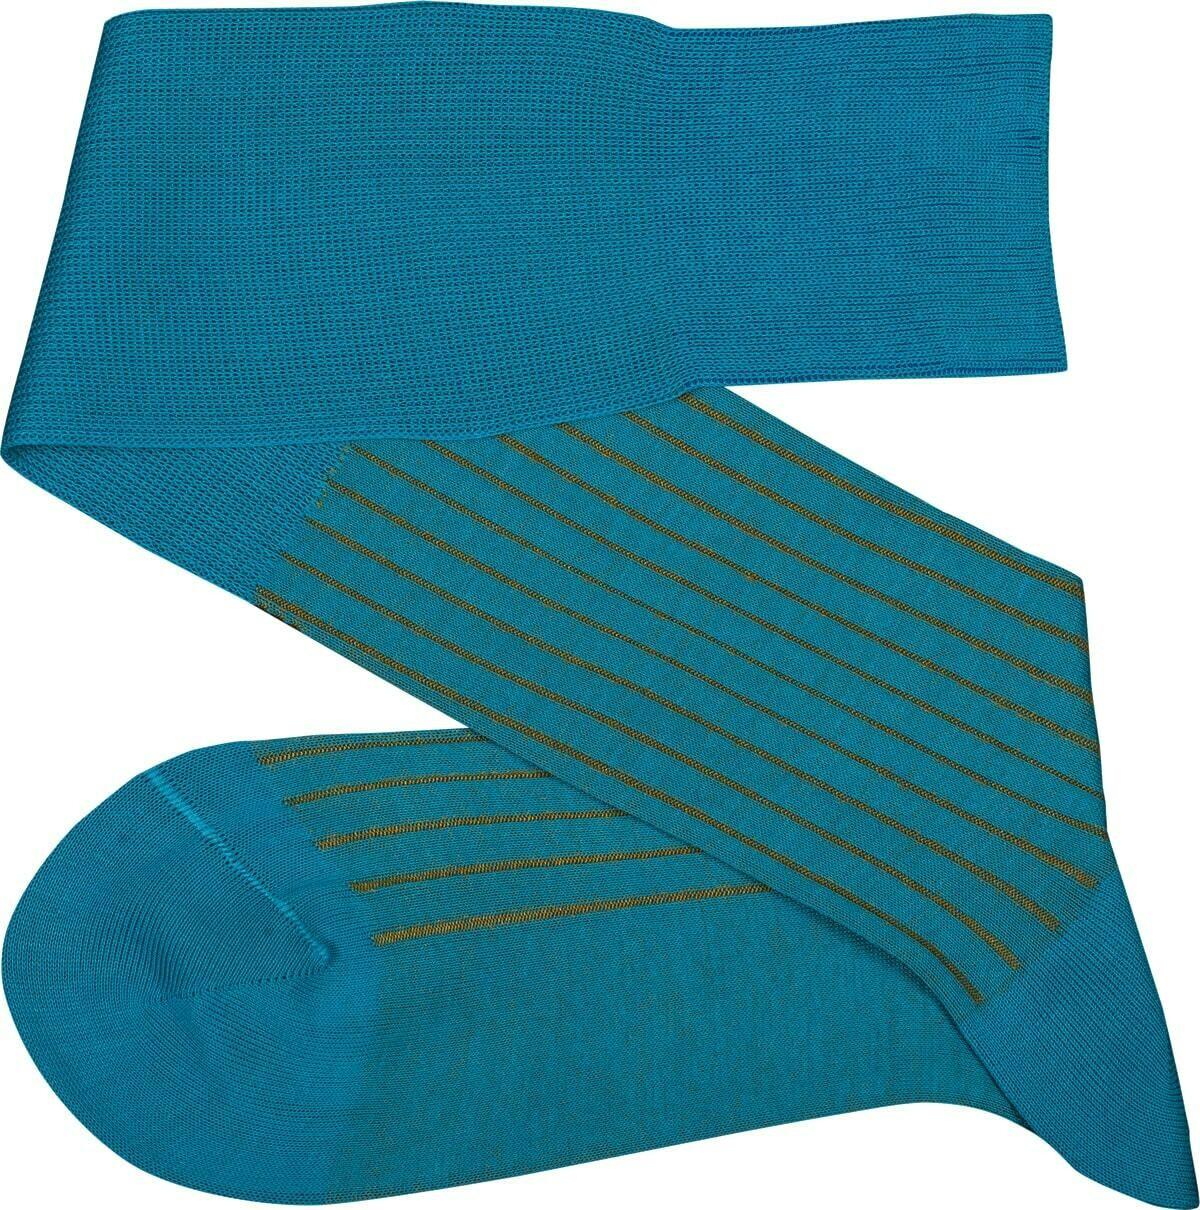 Chaussettes Lignées Turquoise/Moutarde